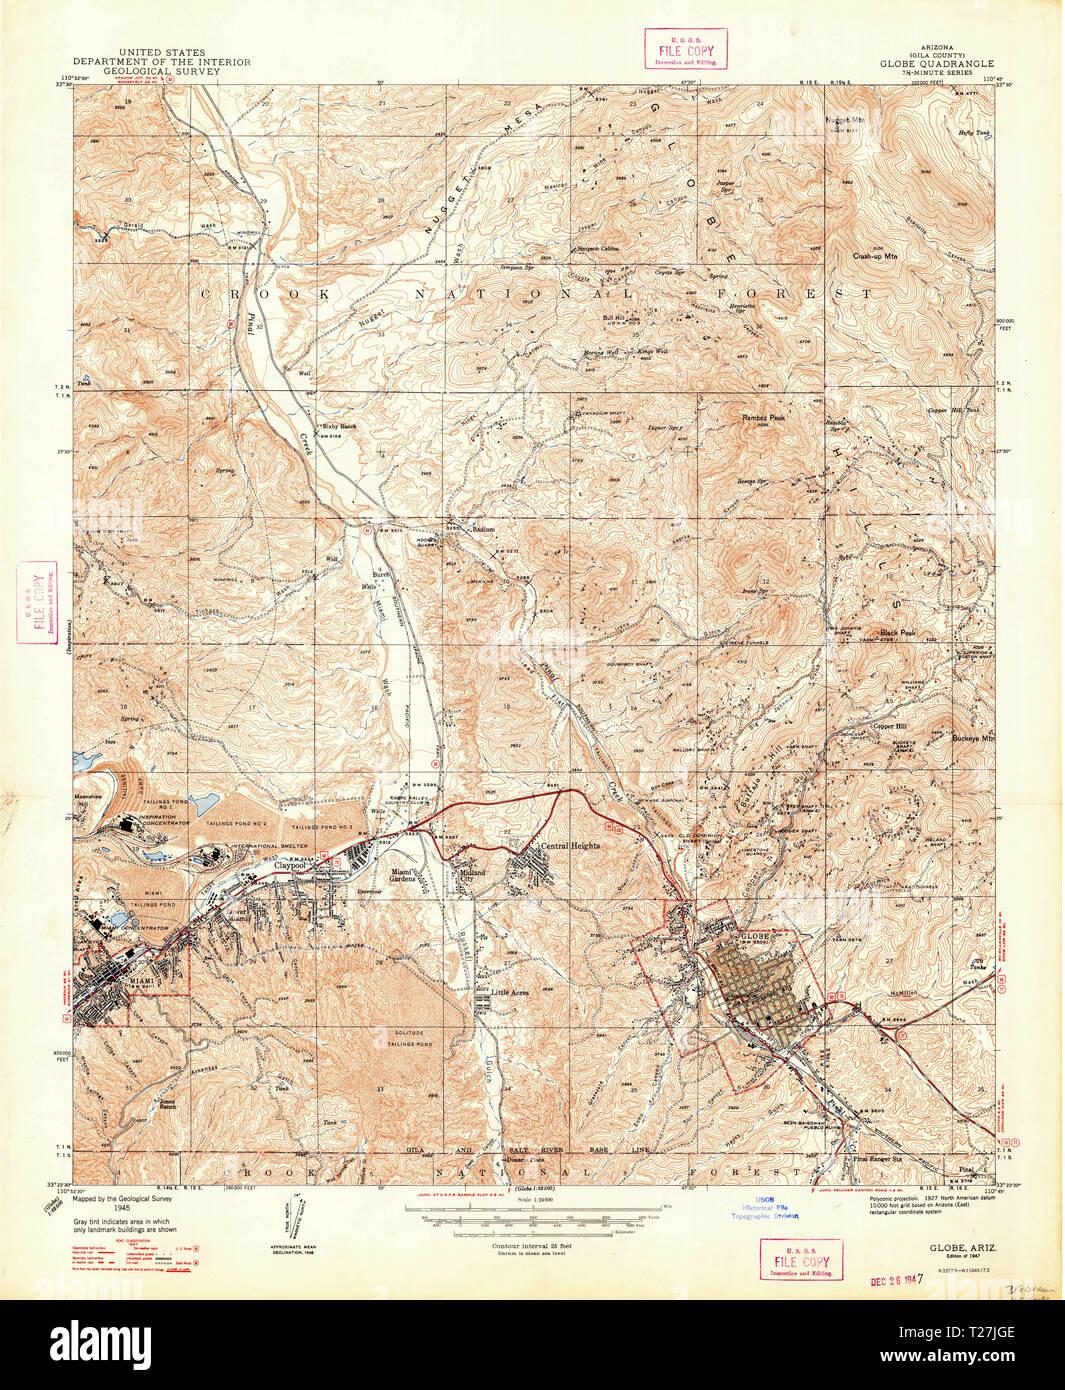 Map Of Arizona Only.Usgs Topo Map Arizona Az Globe 311500 1945 24000 Restoration Stock